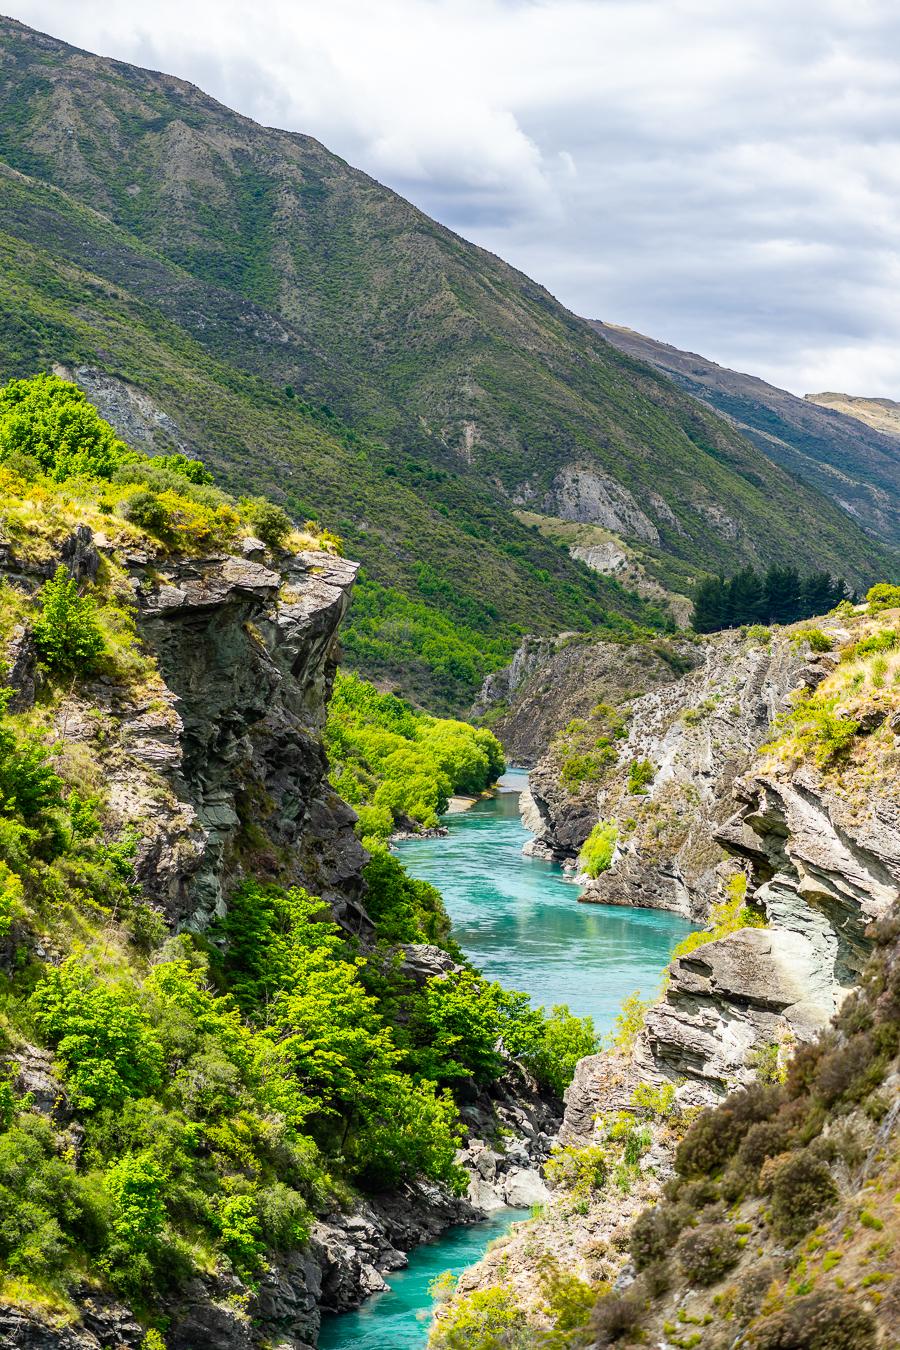 Kawarau Gorge, New Zealand